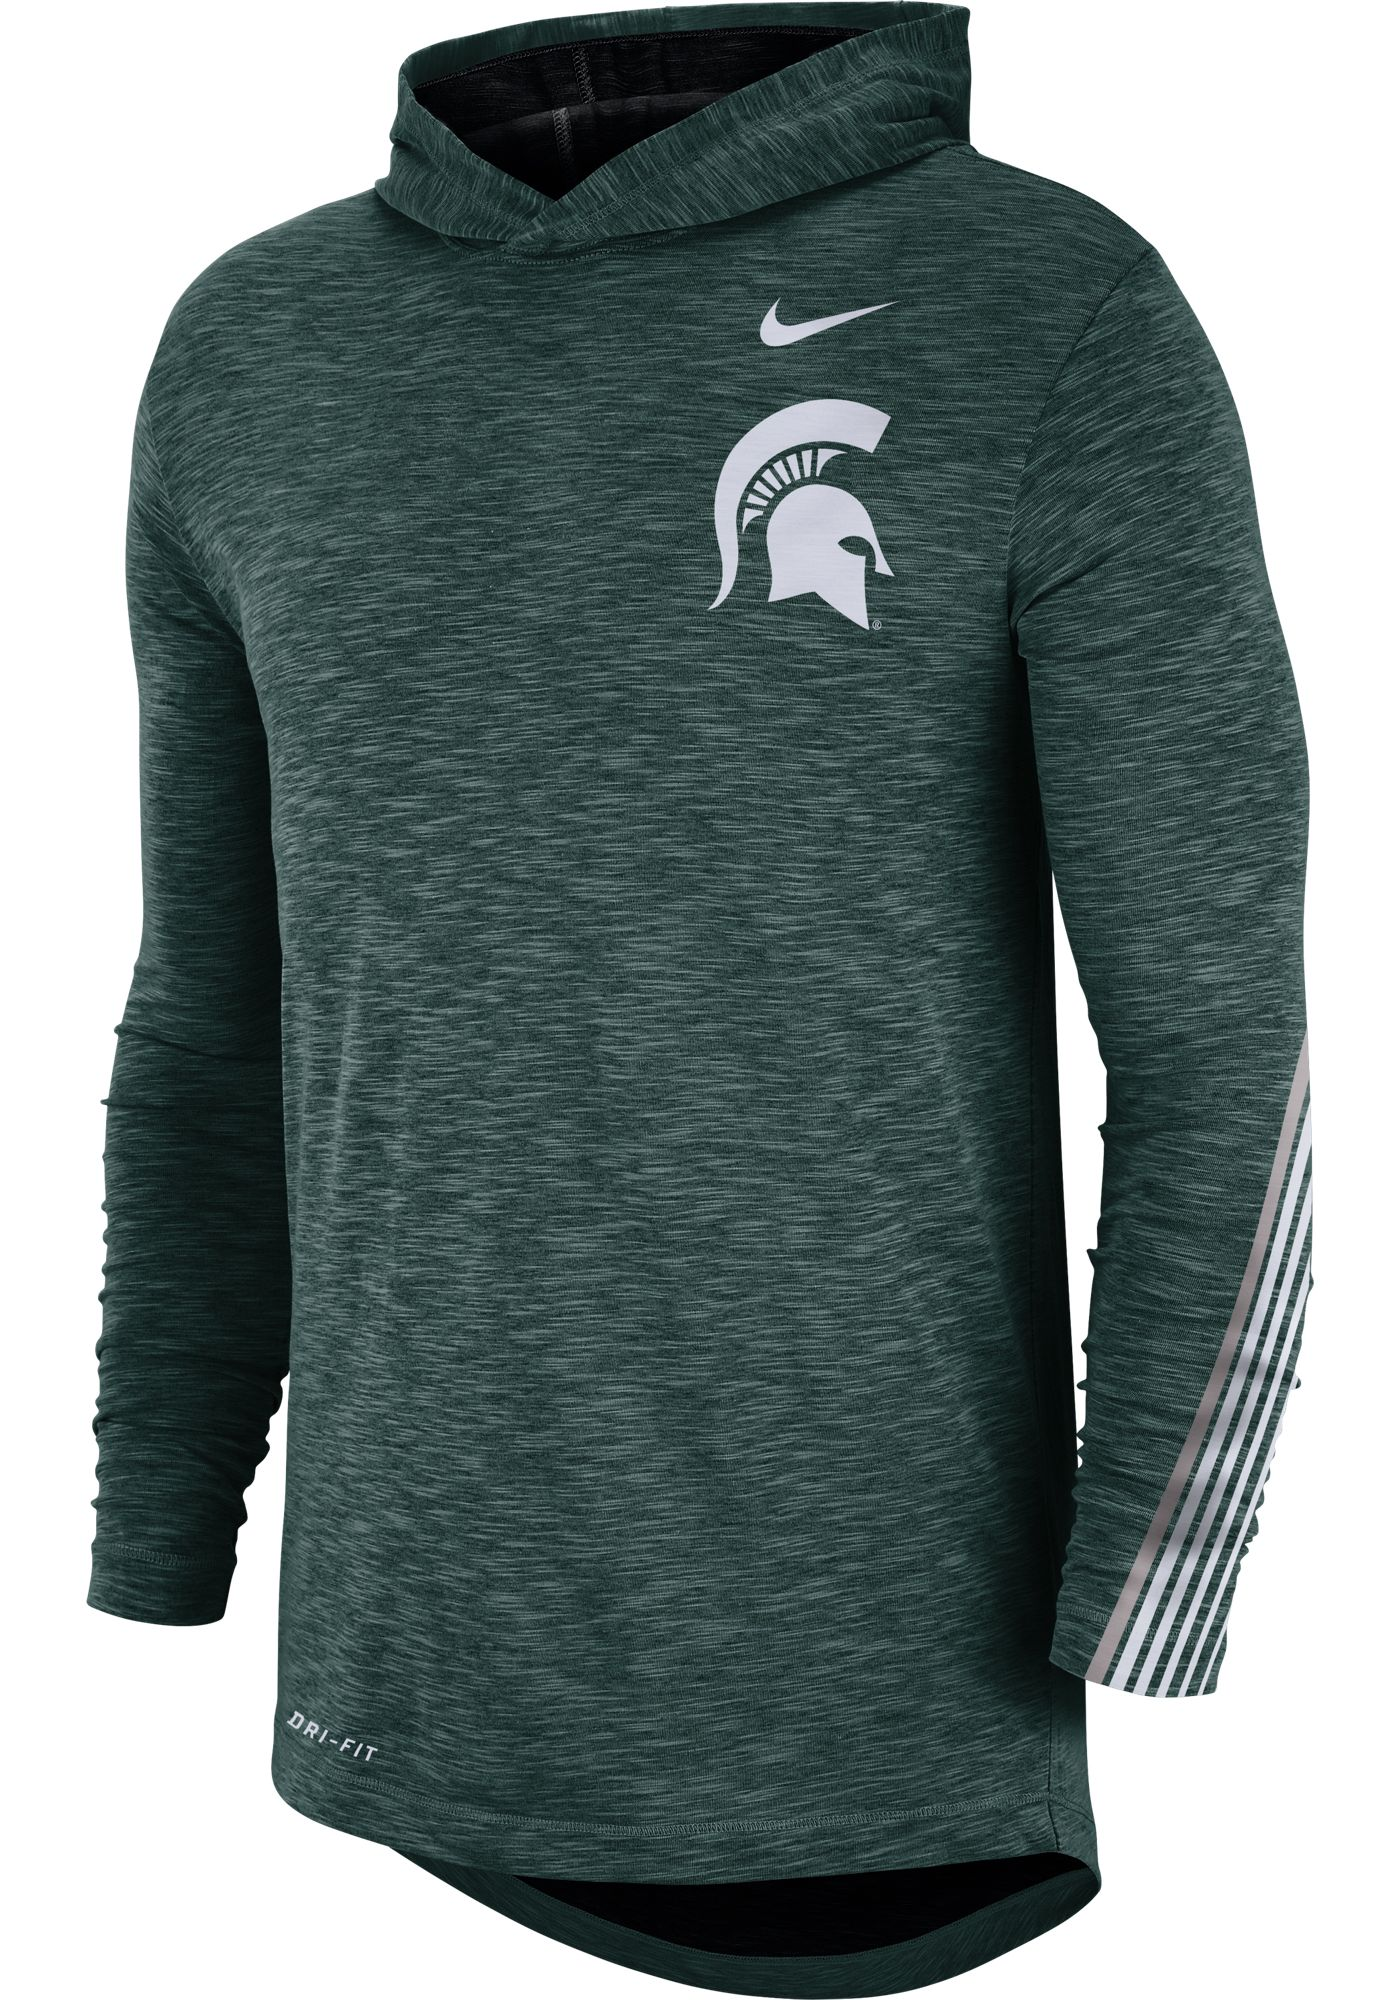 Nike Men's Michigan State Spartans Green Cotton Long Sleeve Hoodie T-Shirt